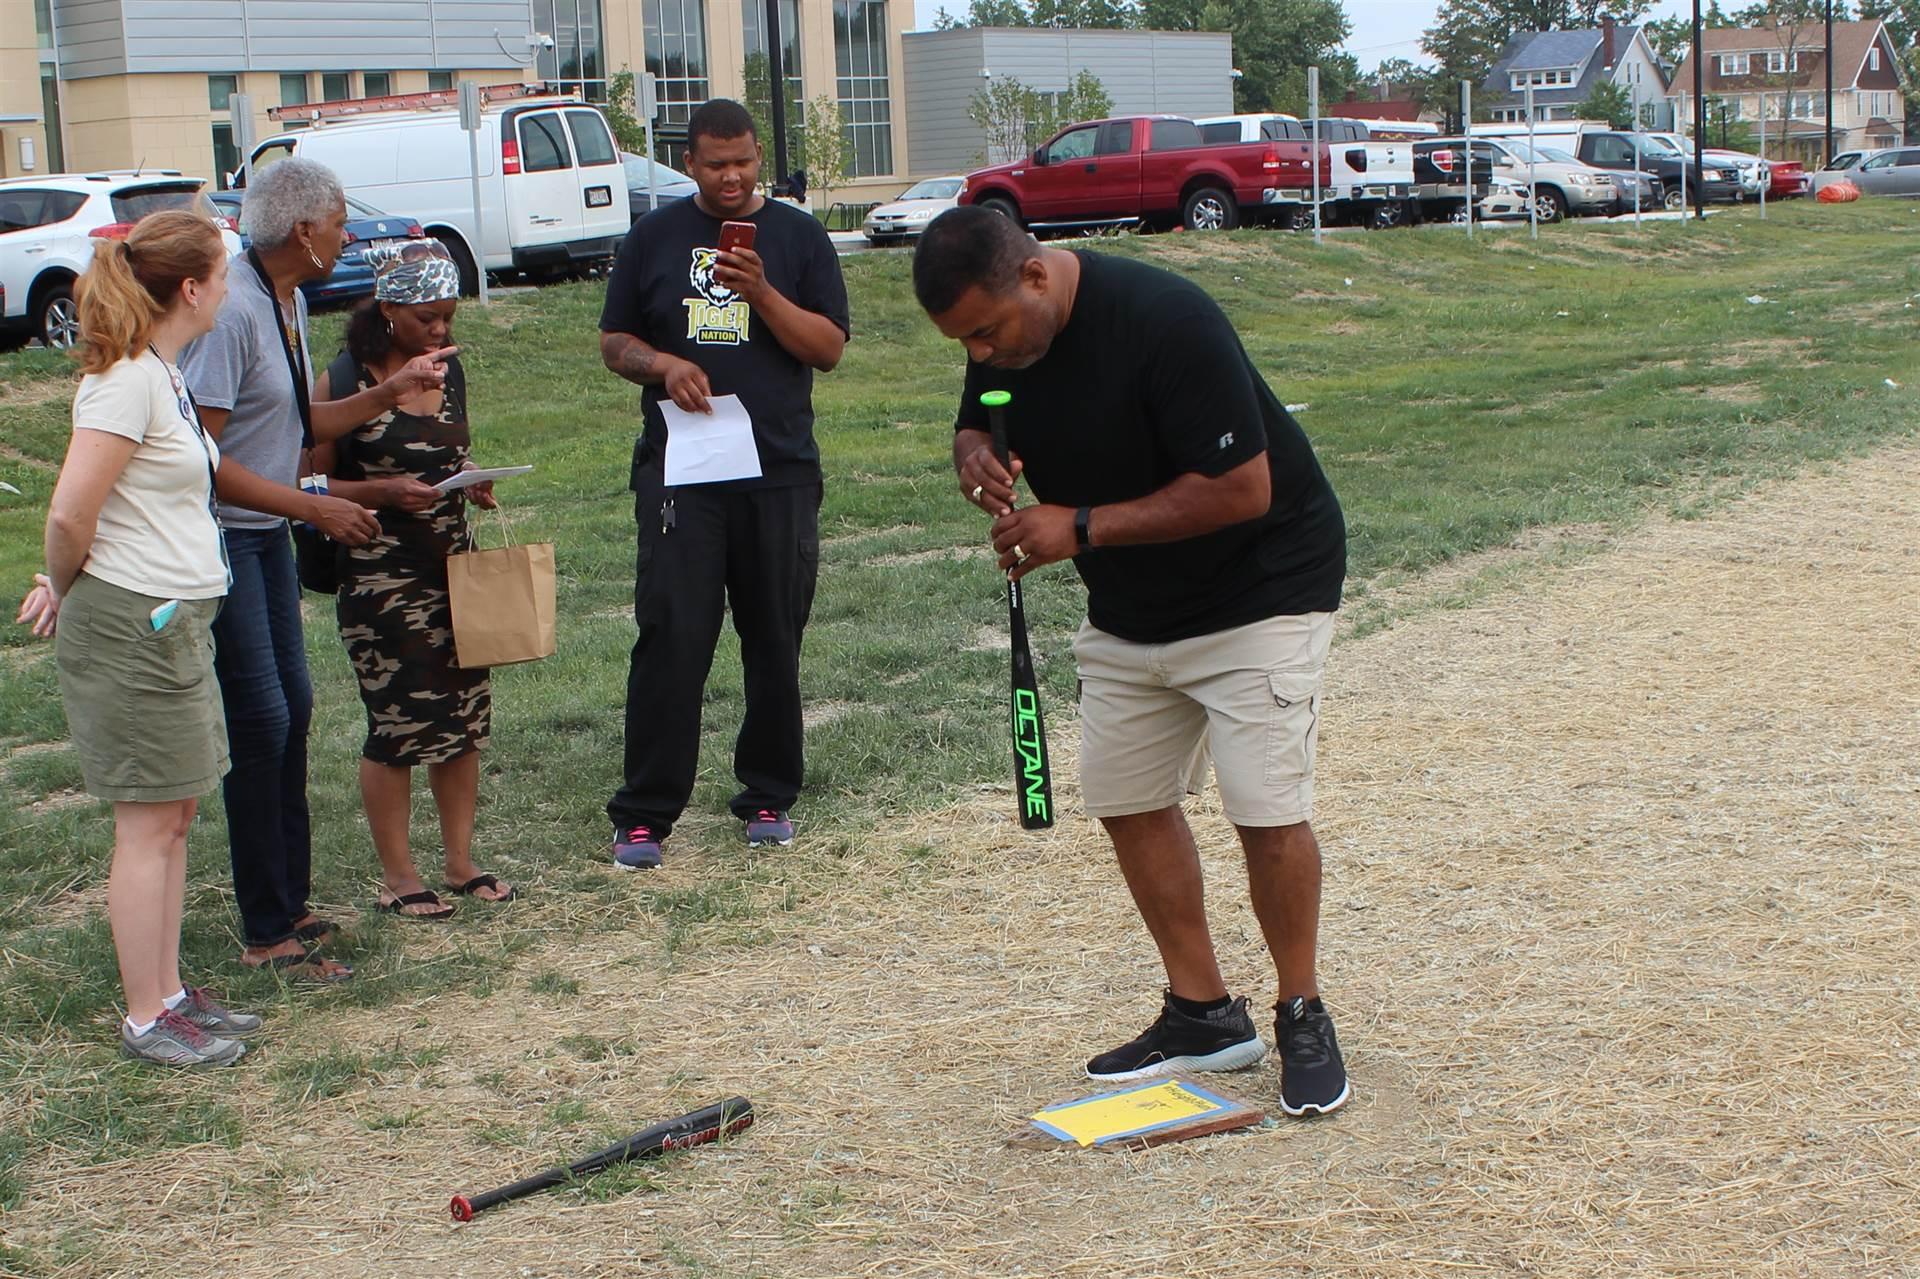 PE teacher Mike Jones expertly executes activity at baseball field.